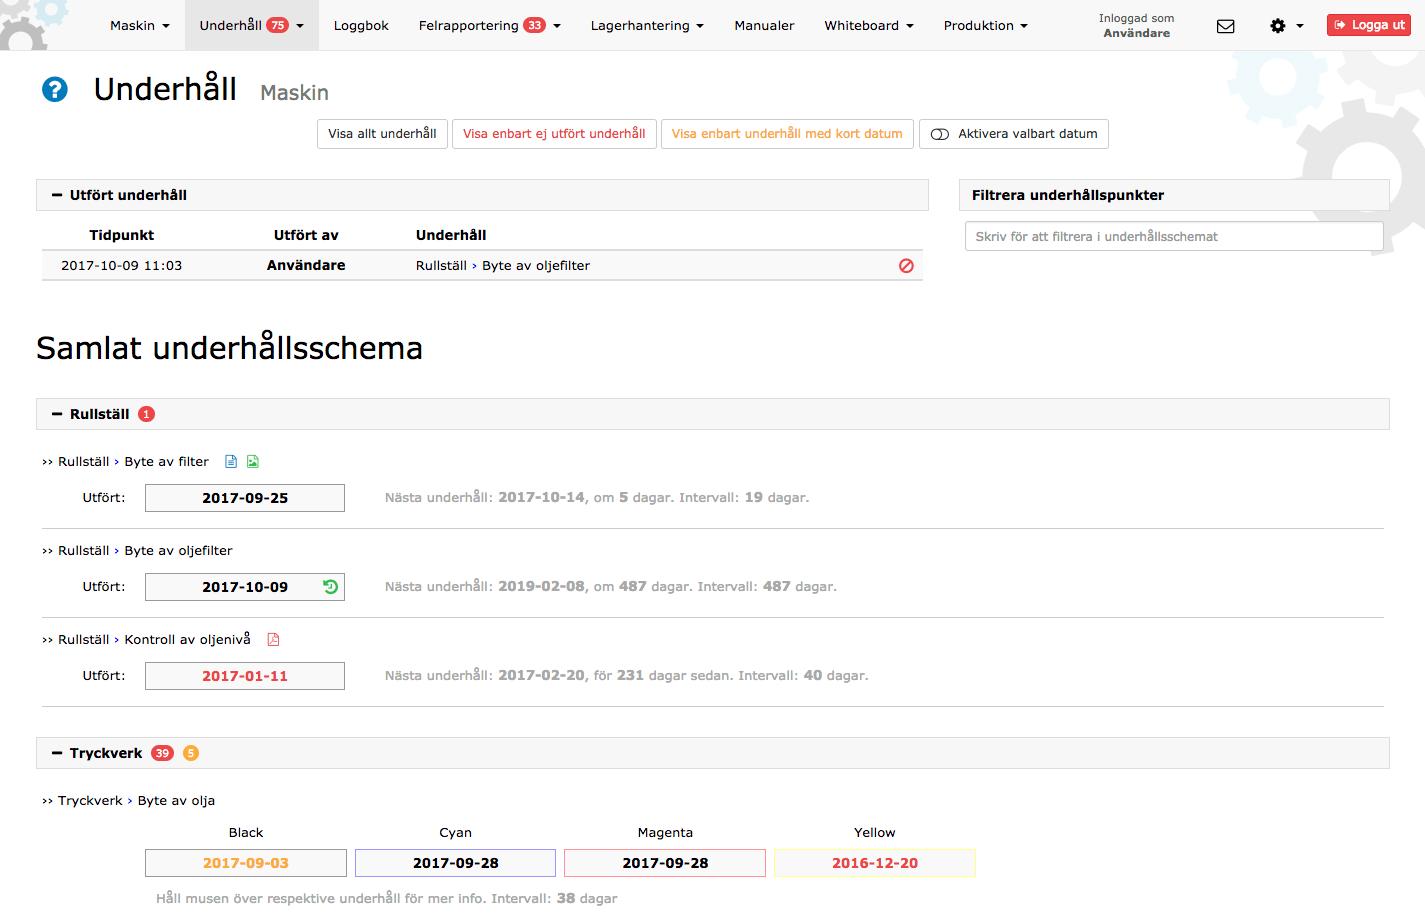 Maintenance schedule i Produktionsportal.se